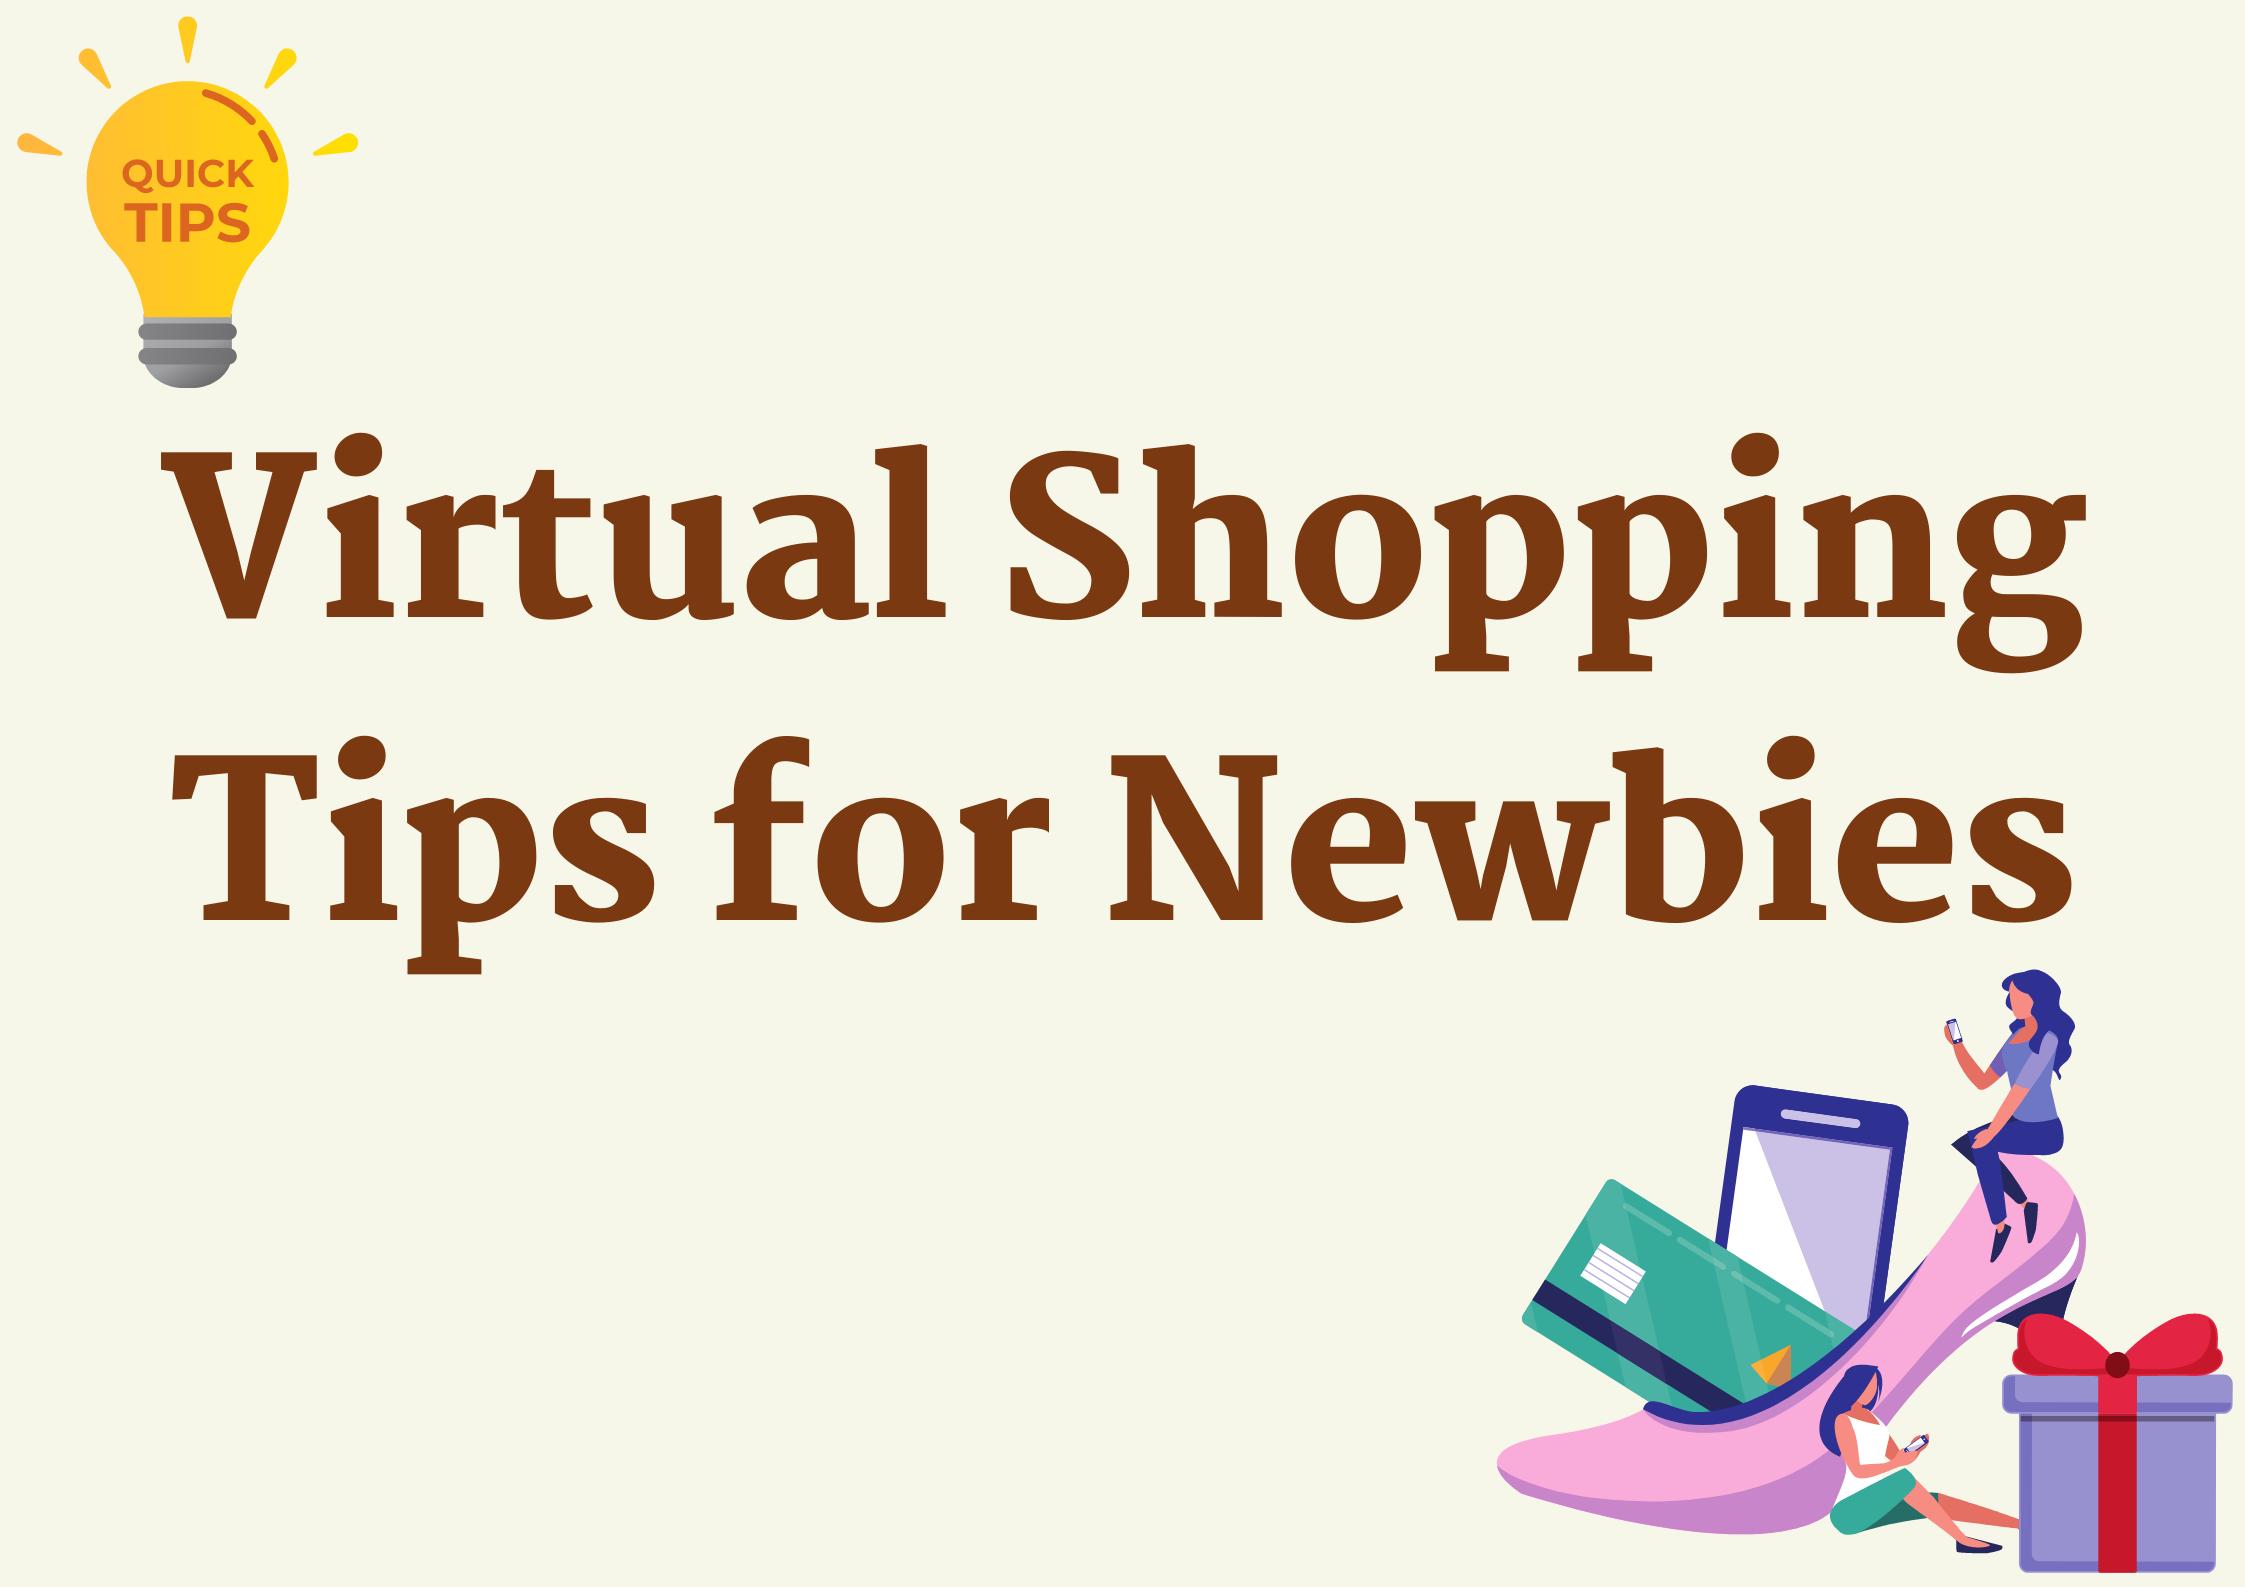 Virtual-Shopping-Tips-for-Newbies